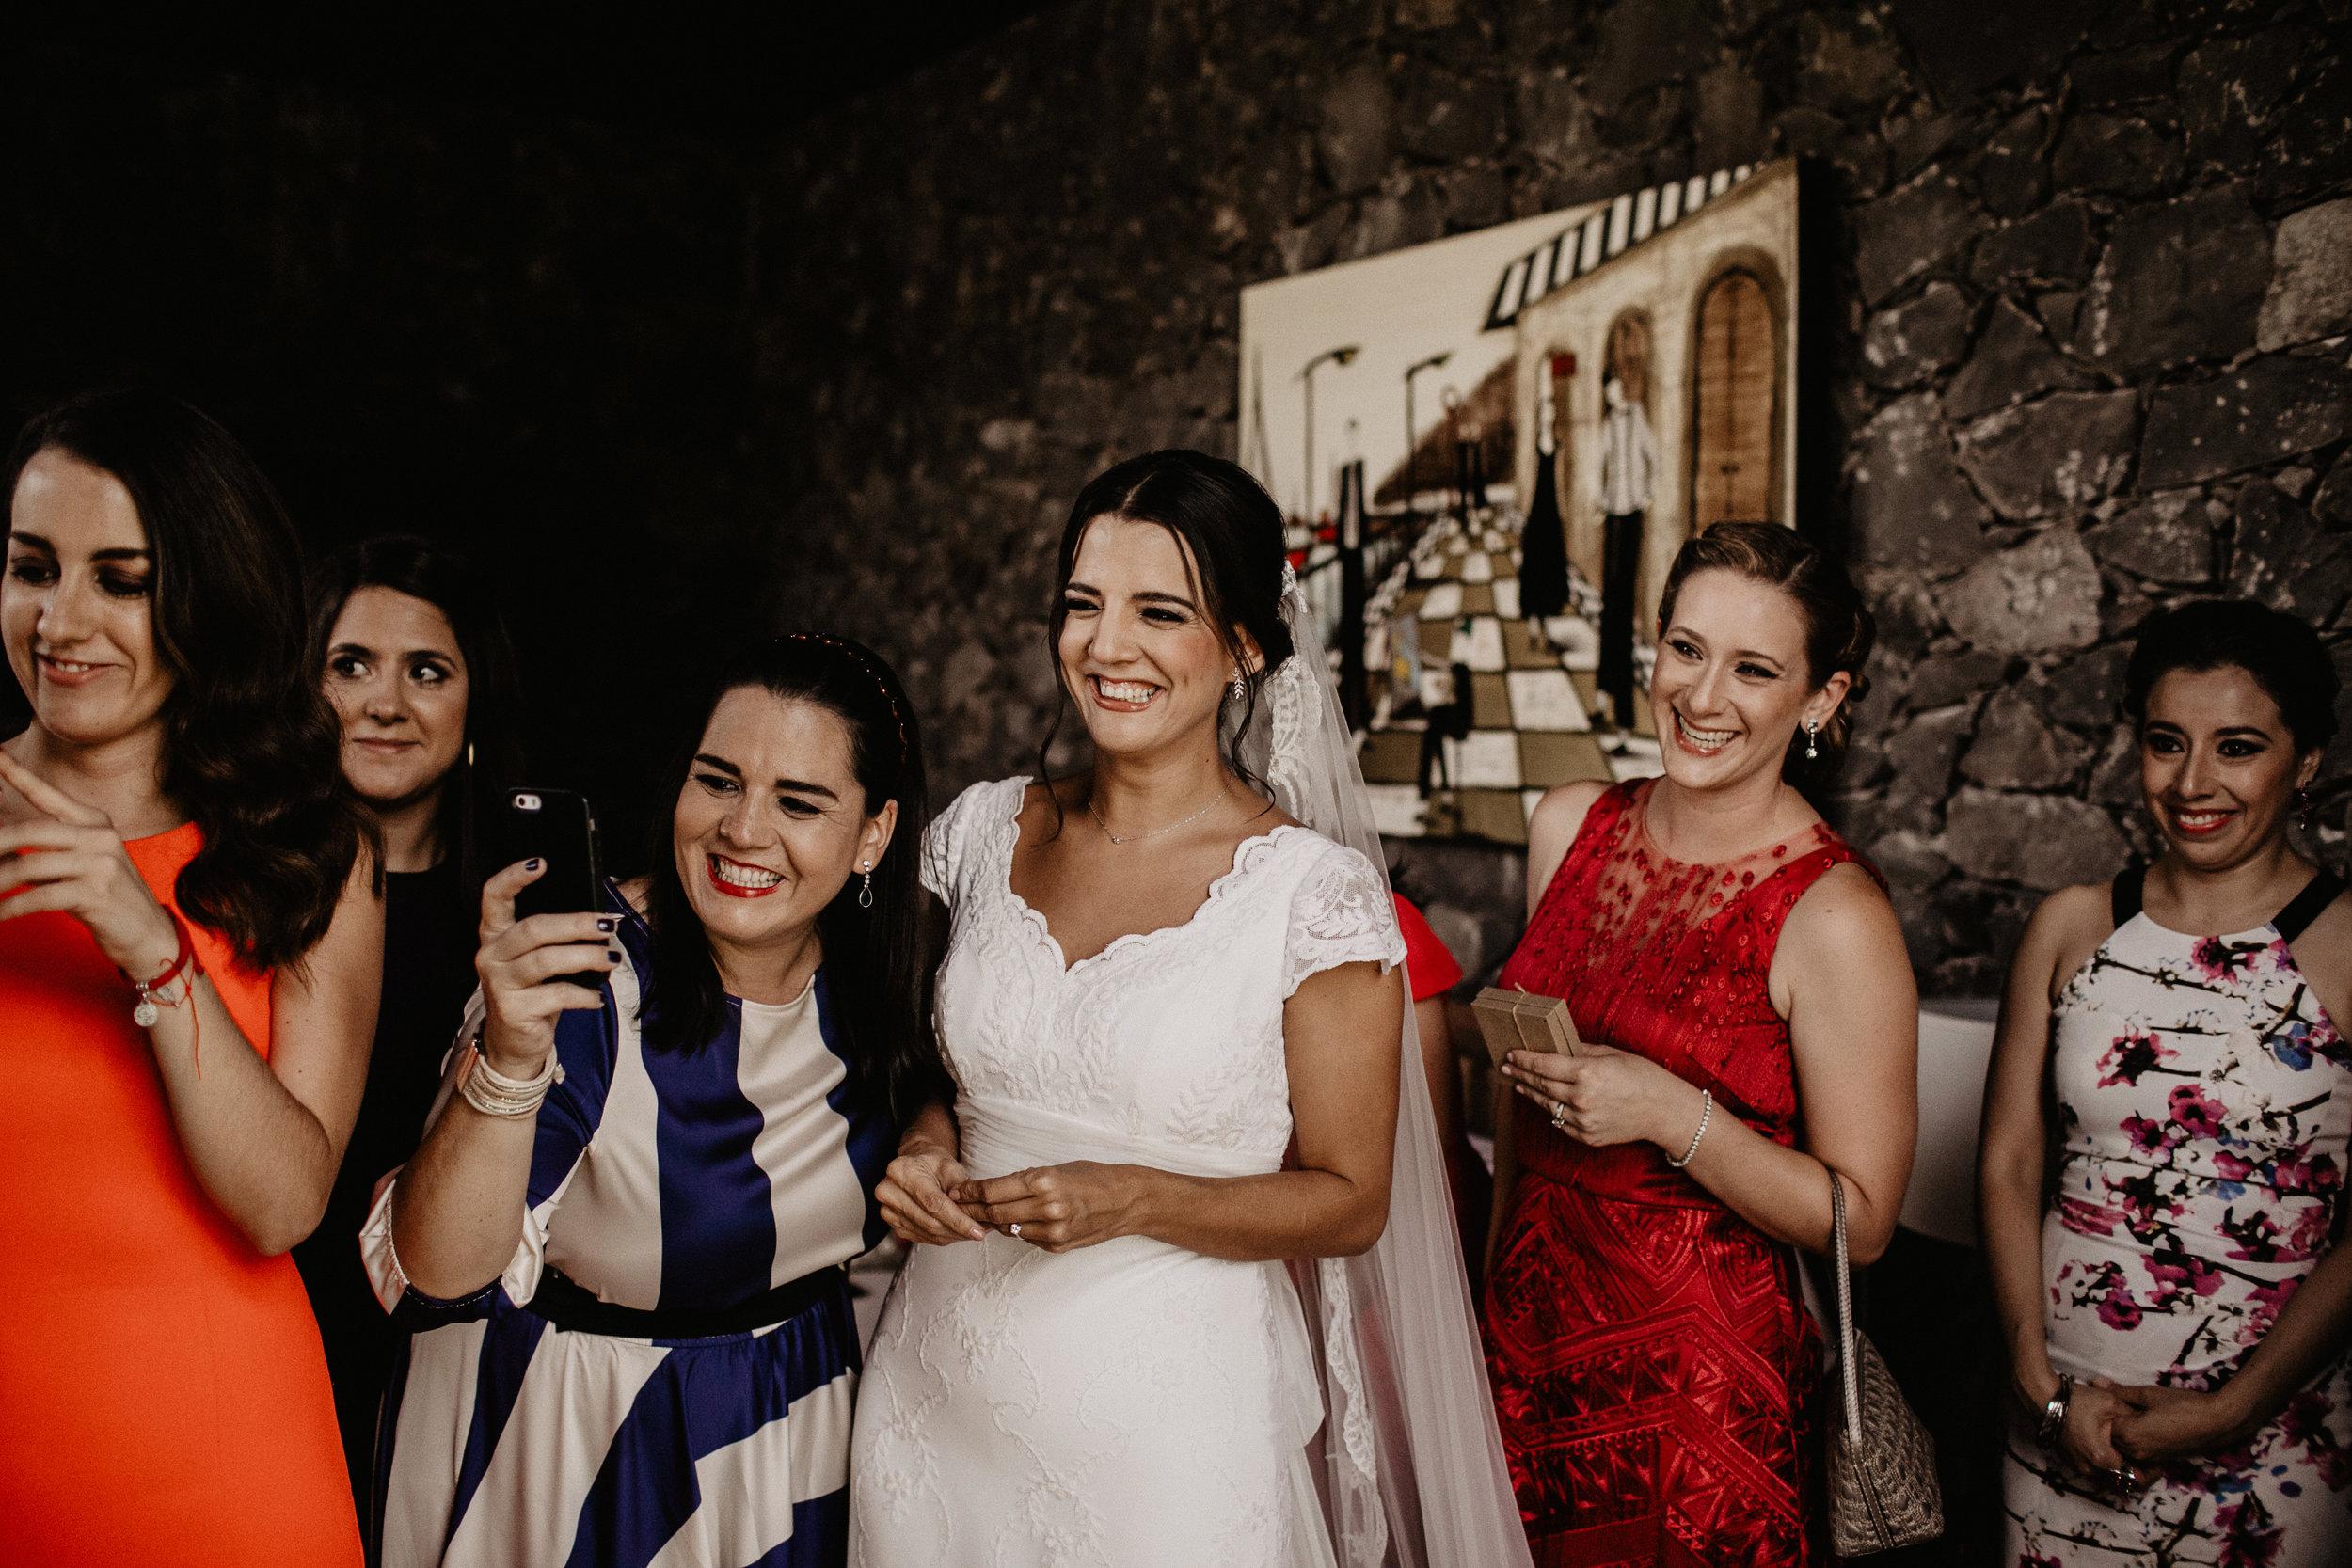 alfonso_flores_destination_wedding_photographer_pau_alonso_205.JPG